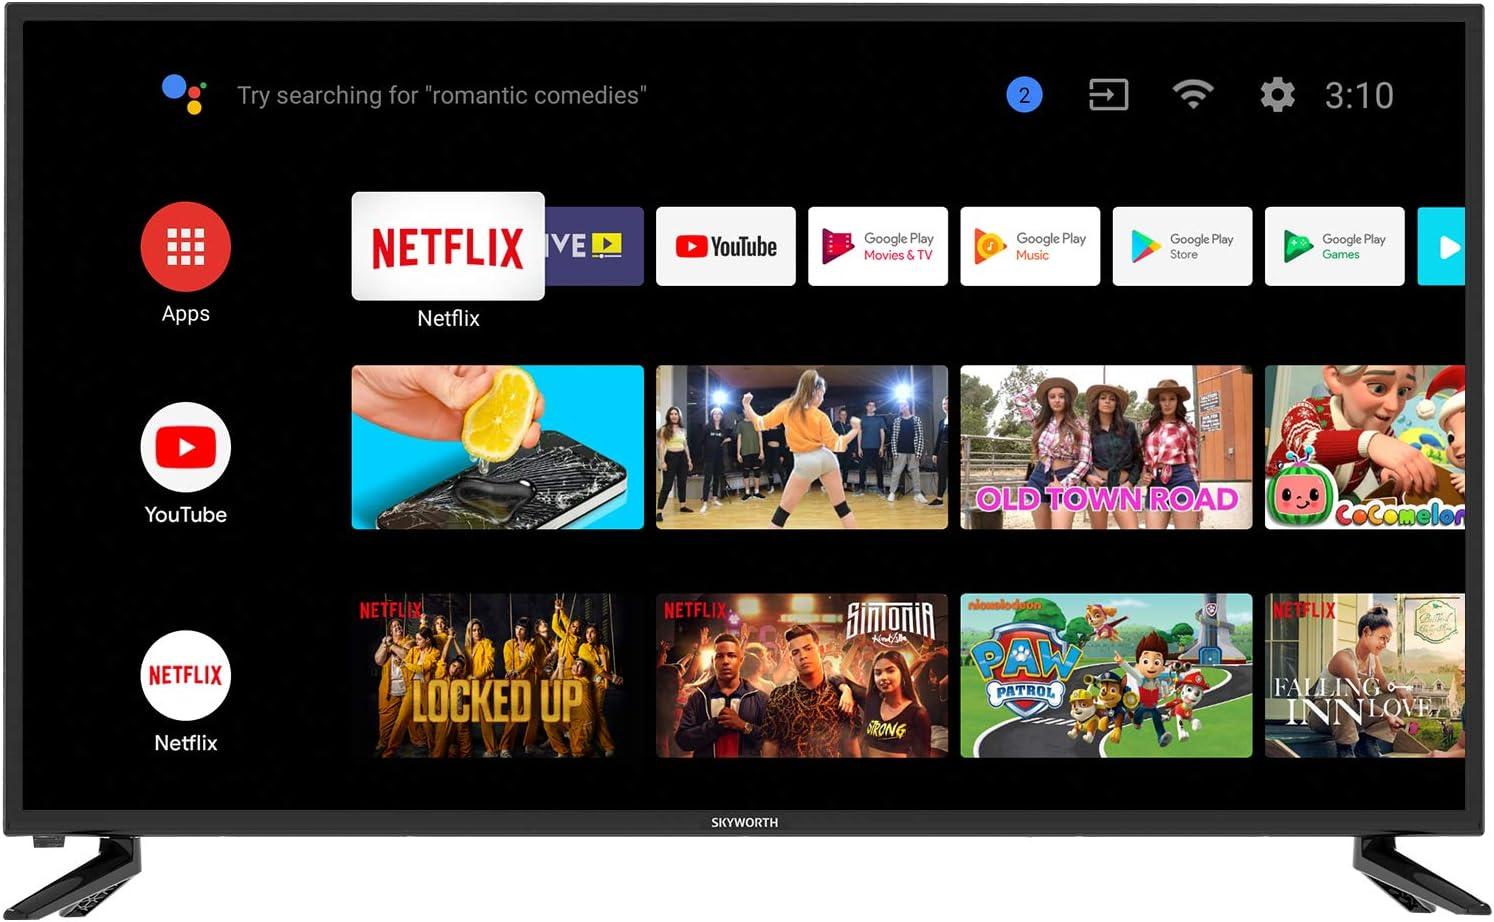 Amazon Com Skyworth 42s3g Inch Premium 1080p Hd Led Television Quad Core Android Tv Smart With Voice Control Google Assistant Chromecast Smart Tv Android Tv Everything Else Skyworth 1080p led tv 40 in review